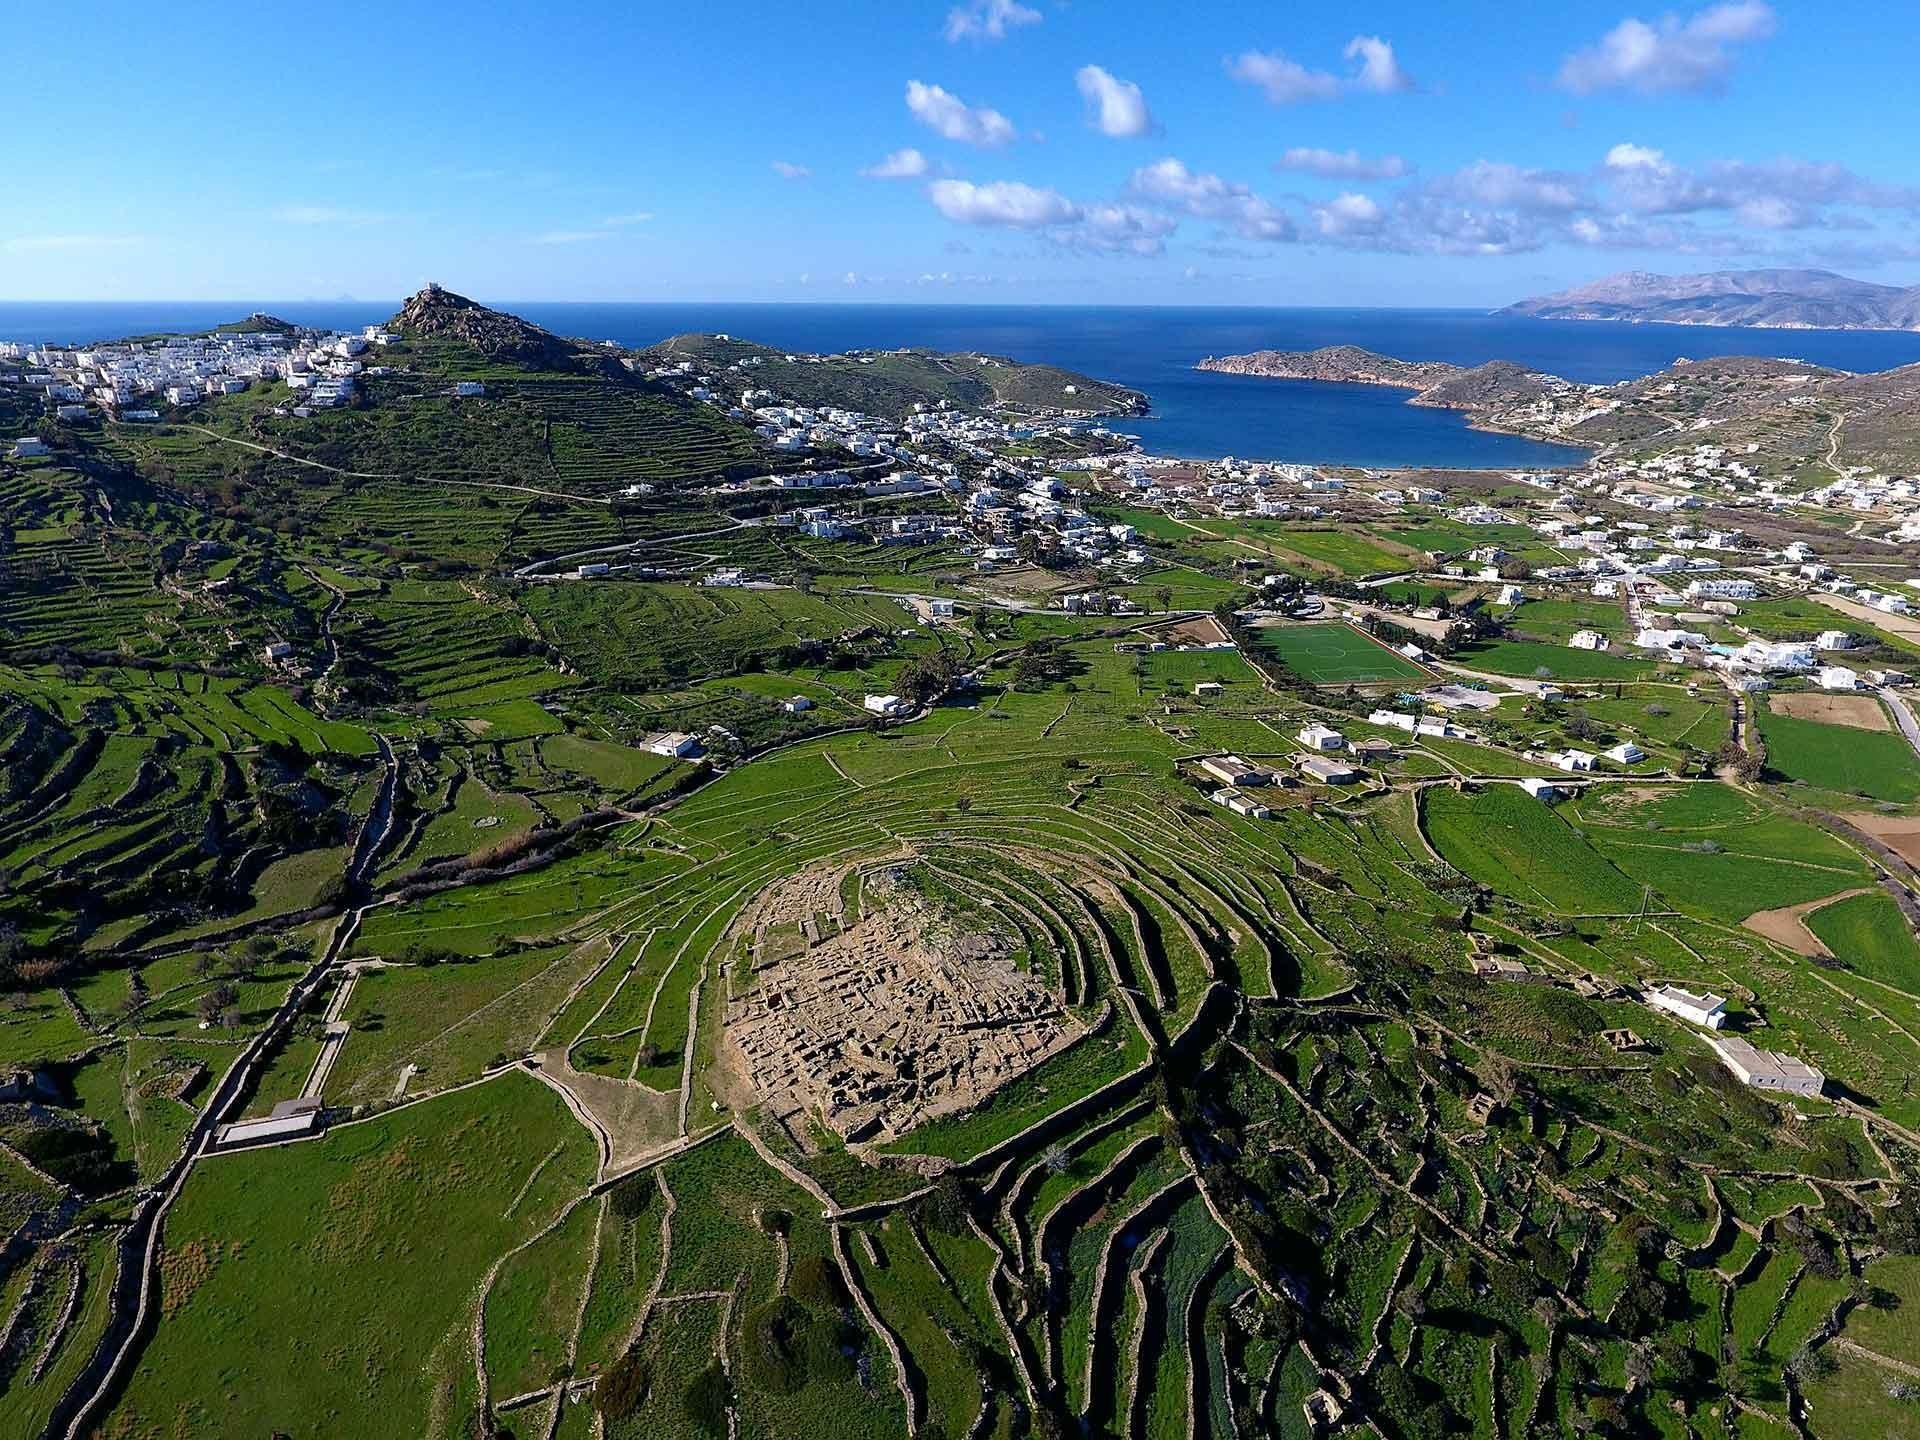 Skarkos, The Prehistoric Settlement - LuxurIOS - Ios Island